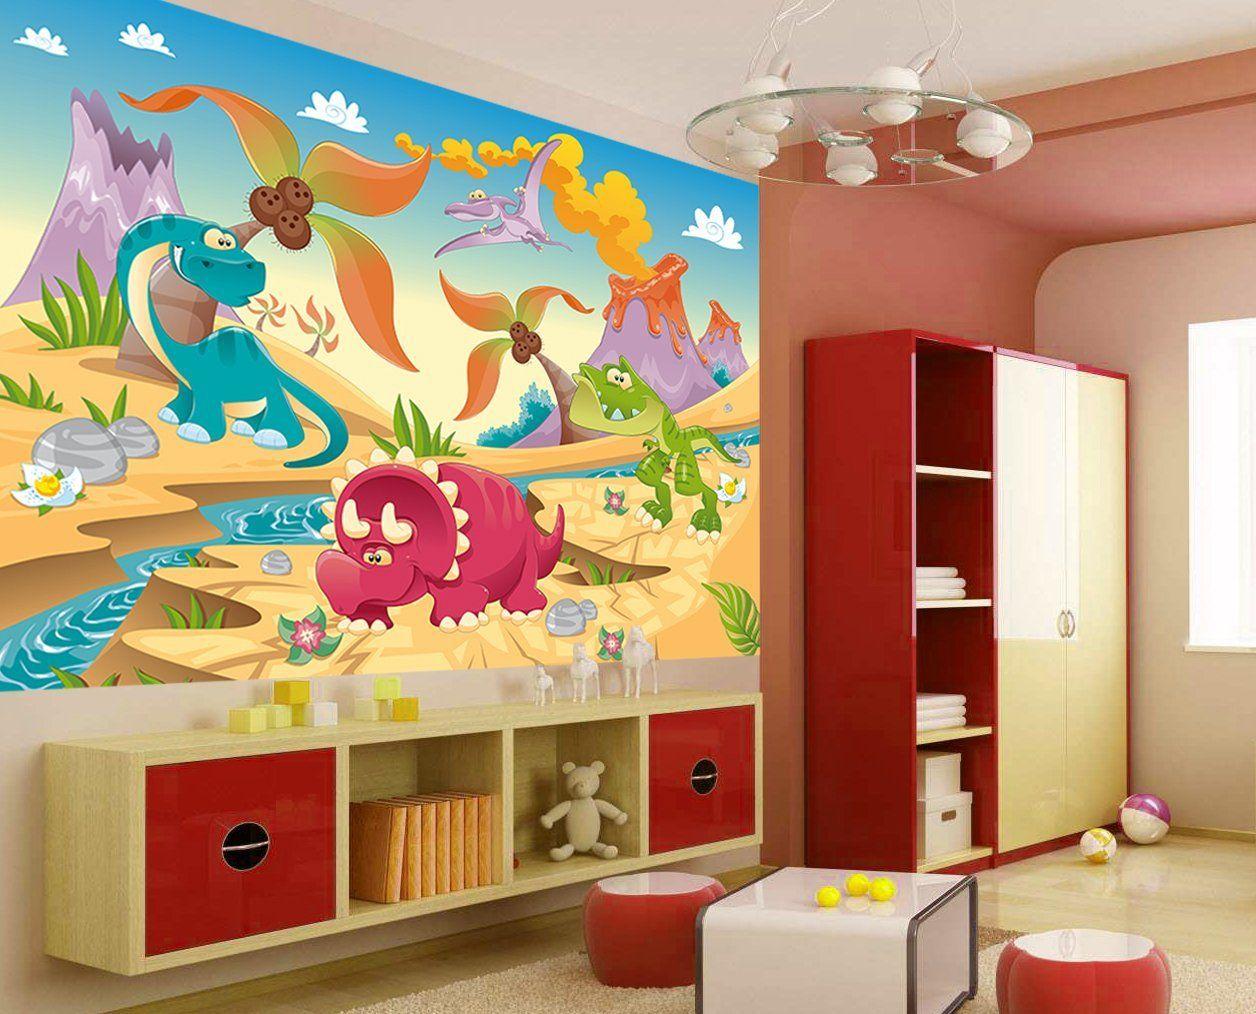 Fototapete Kinder Tapete DINO LAND | Kinderzimmer Dinosaurier Deko ...